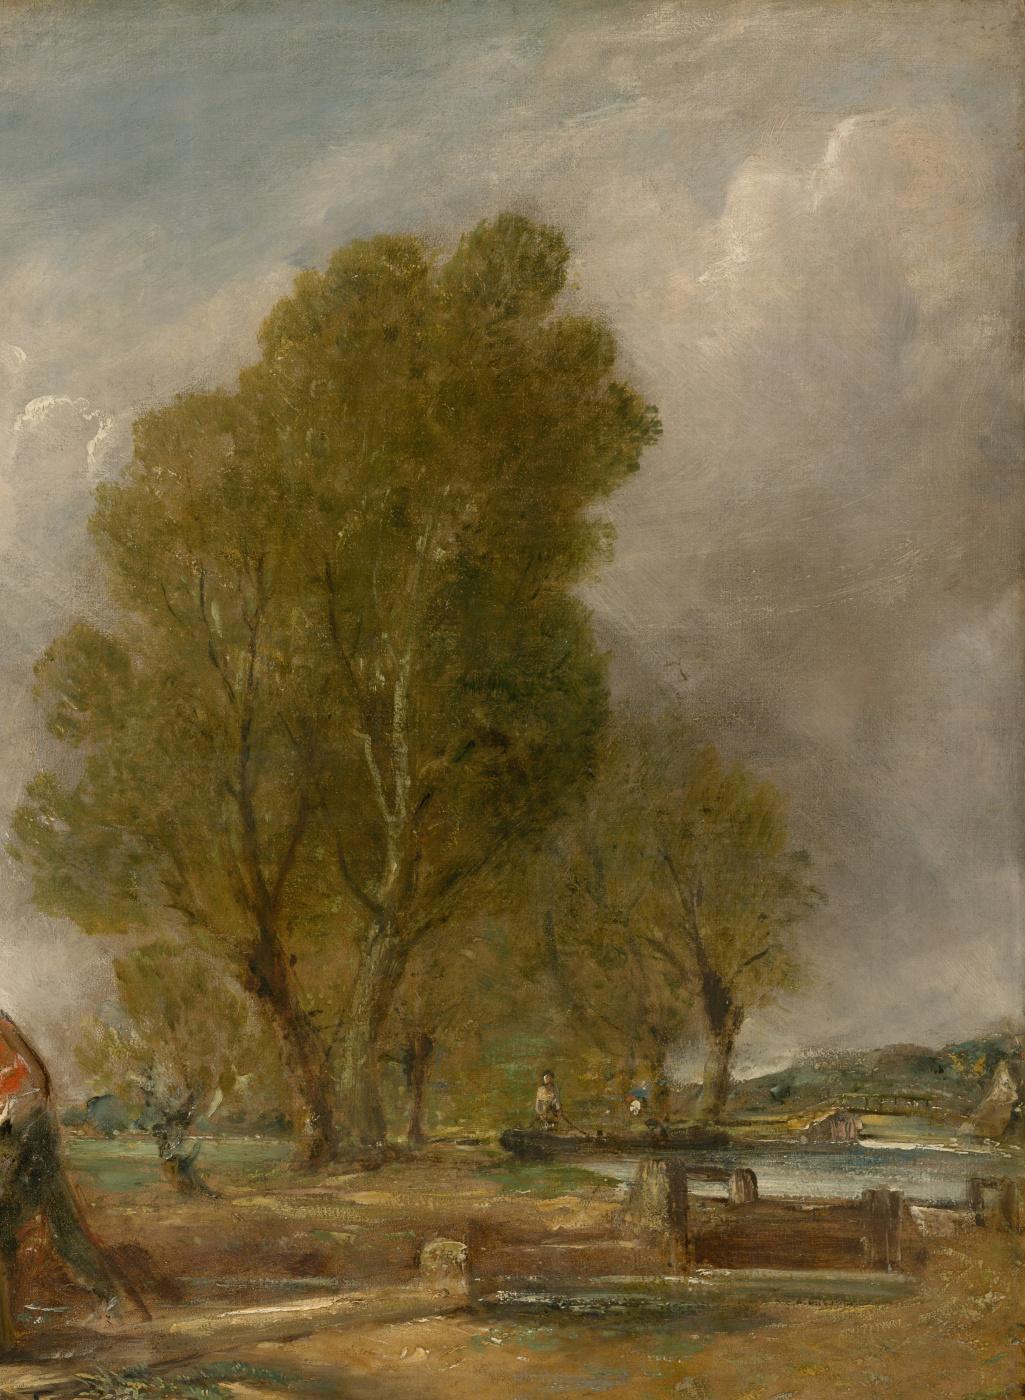 John Constable. Boat passing dam. Sketch. Fragment: landscape